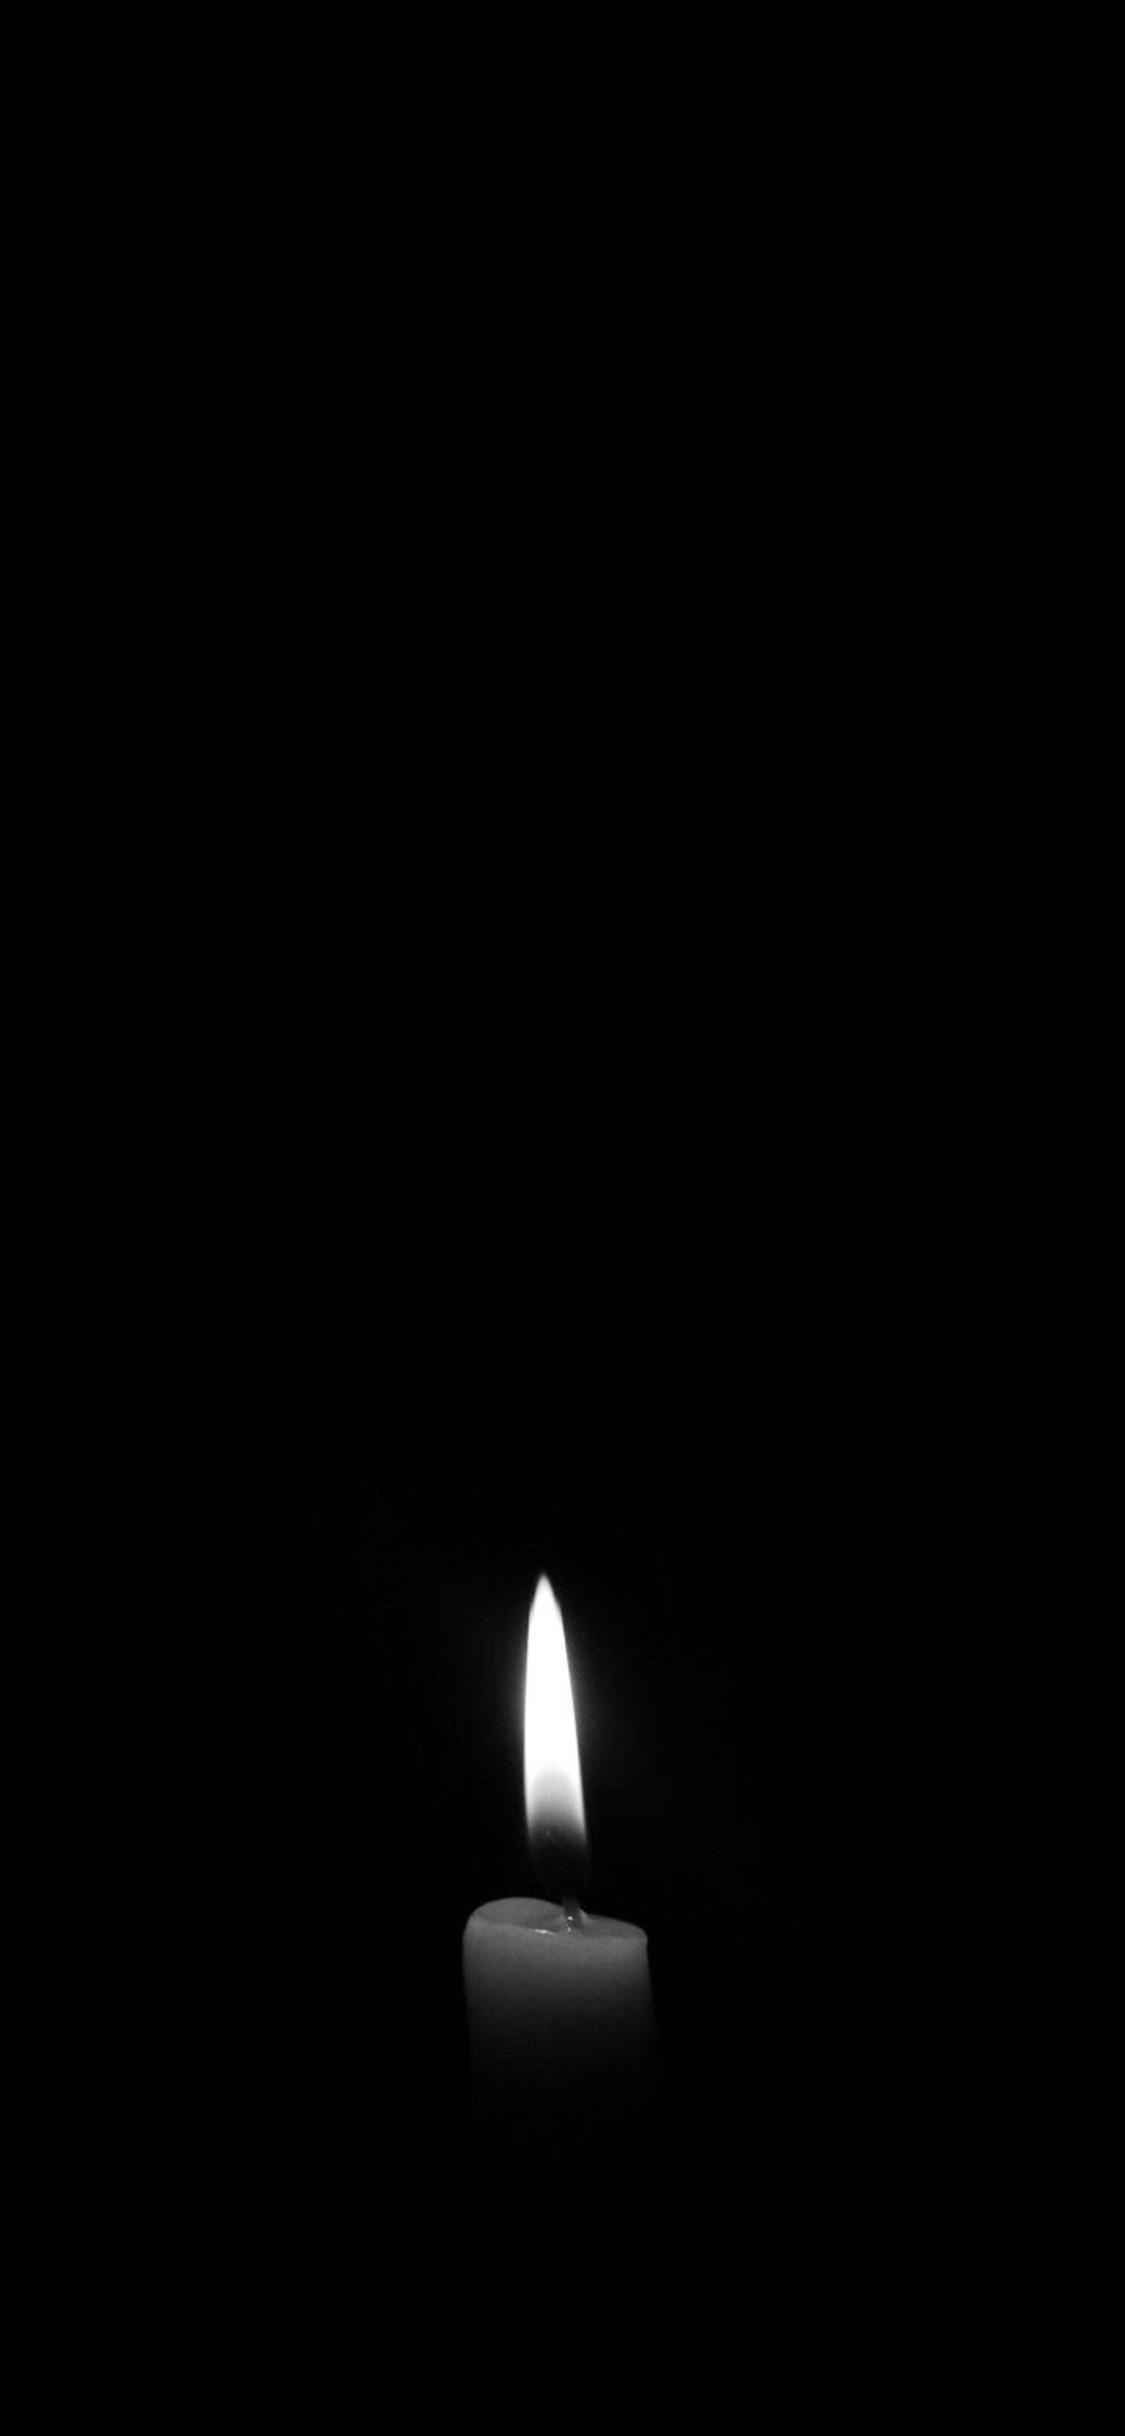 1125x2436 Candle Dark Monochrome Iphone Xs Iphone 10 Iphone X Hd 4k